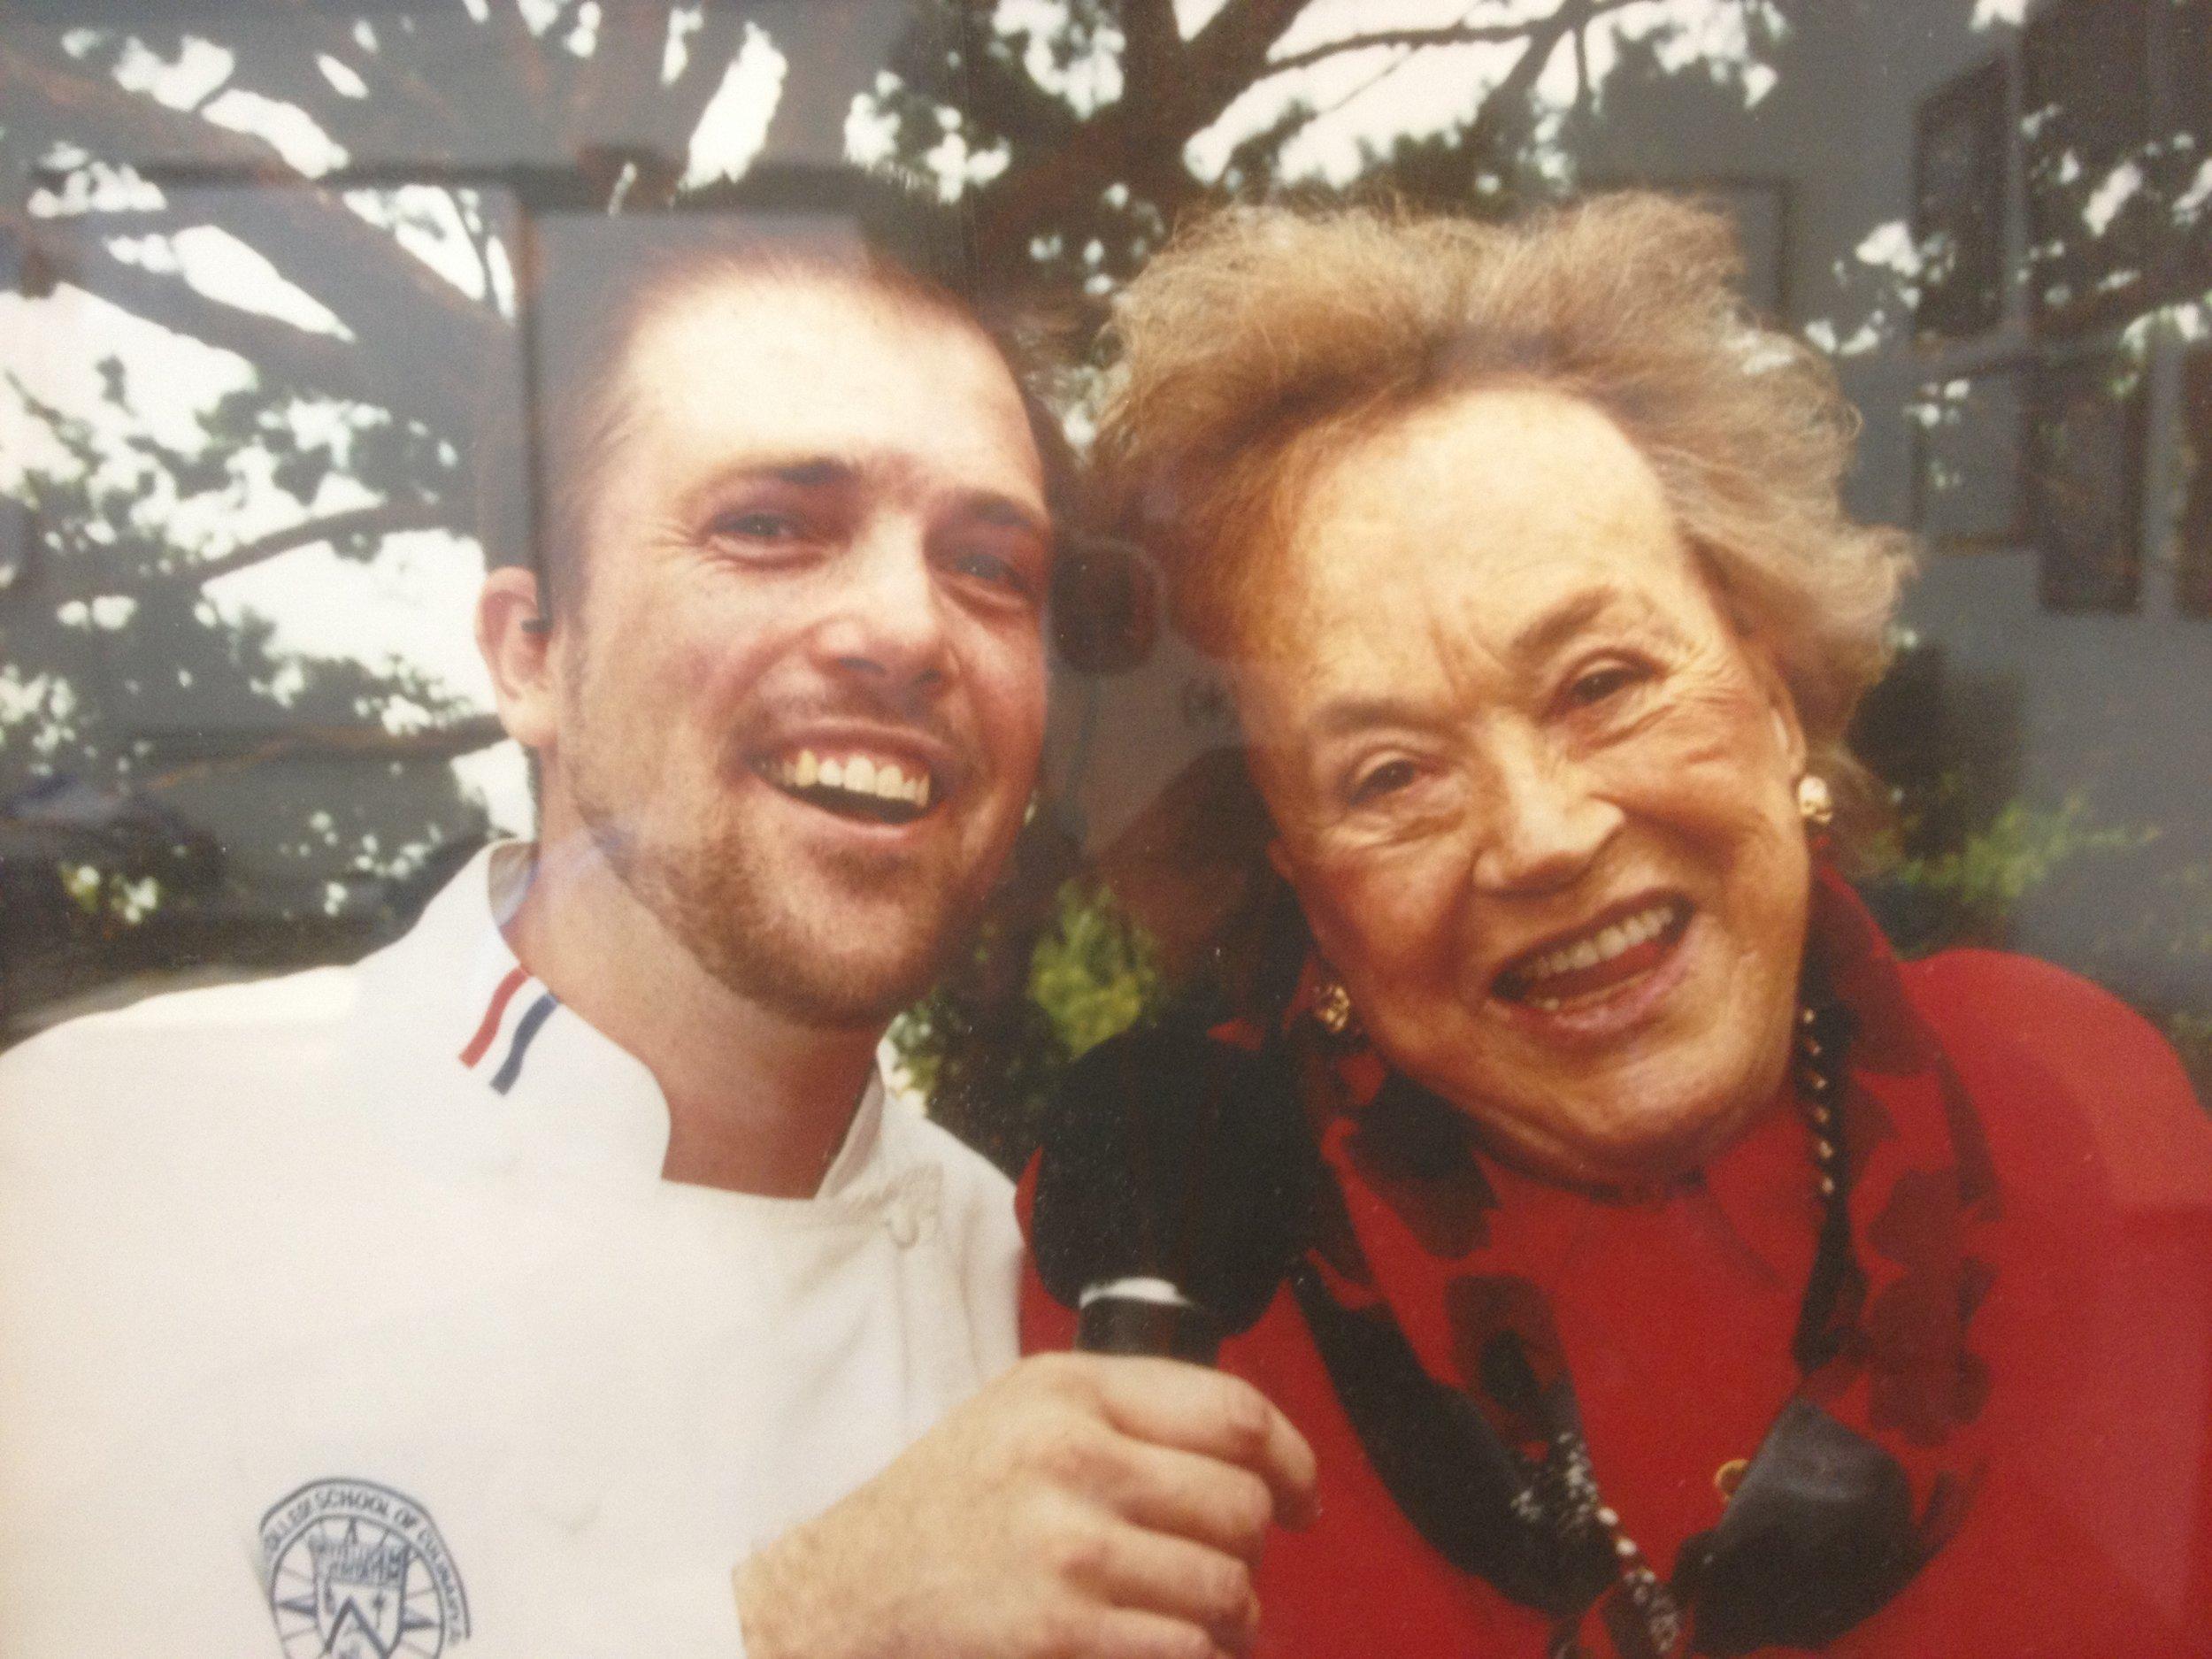 Chef and this idol, Julia Childs